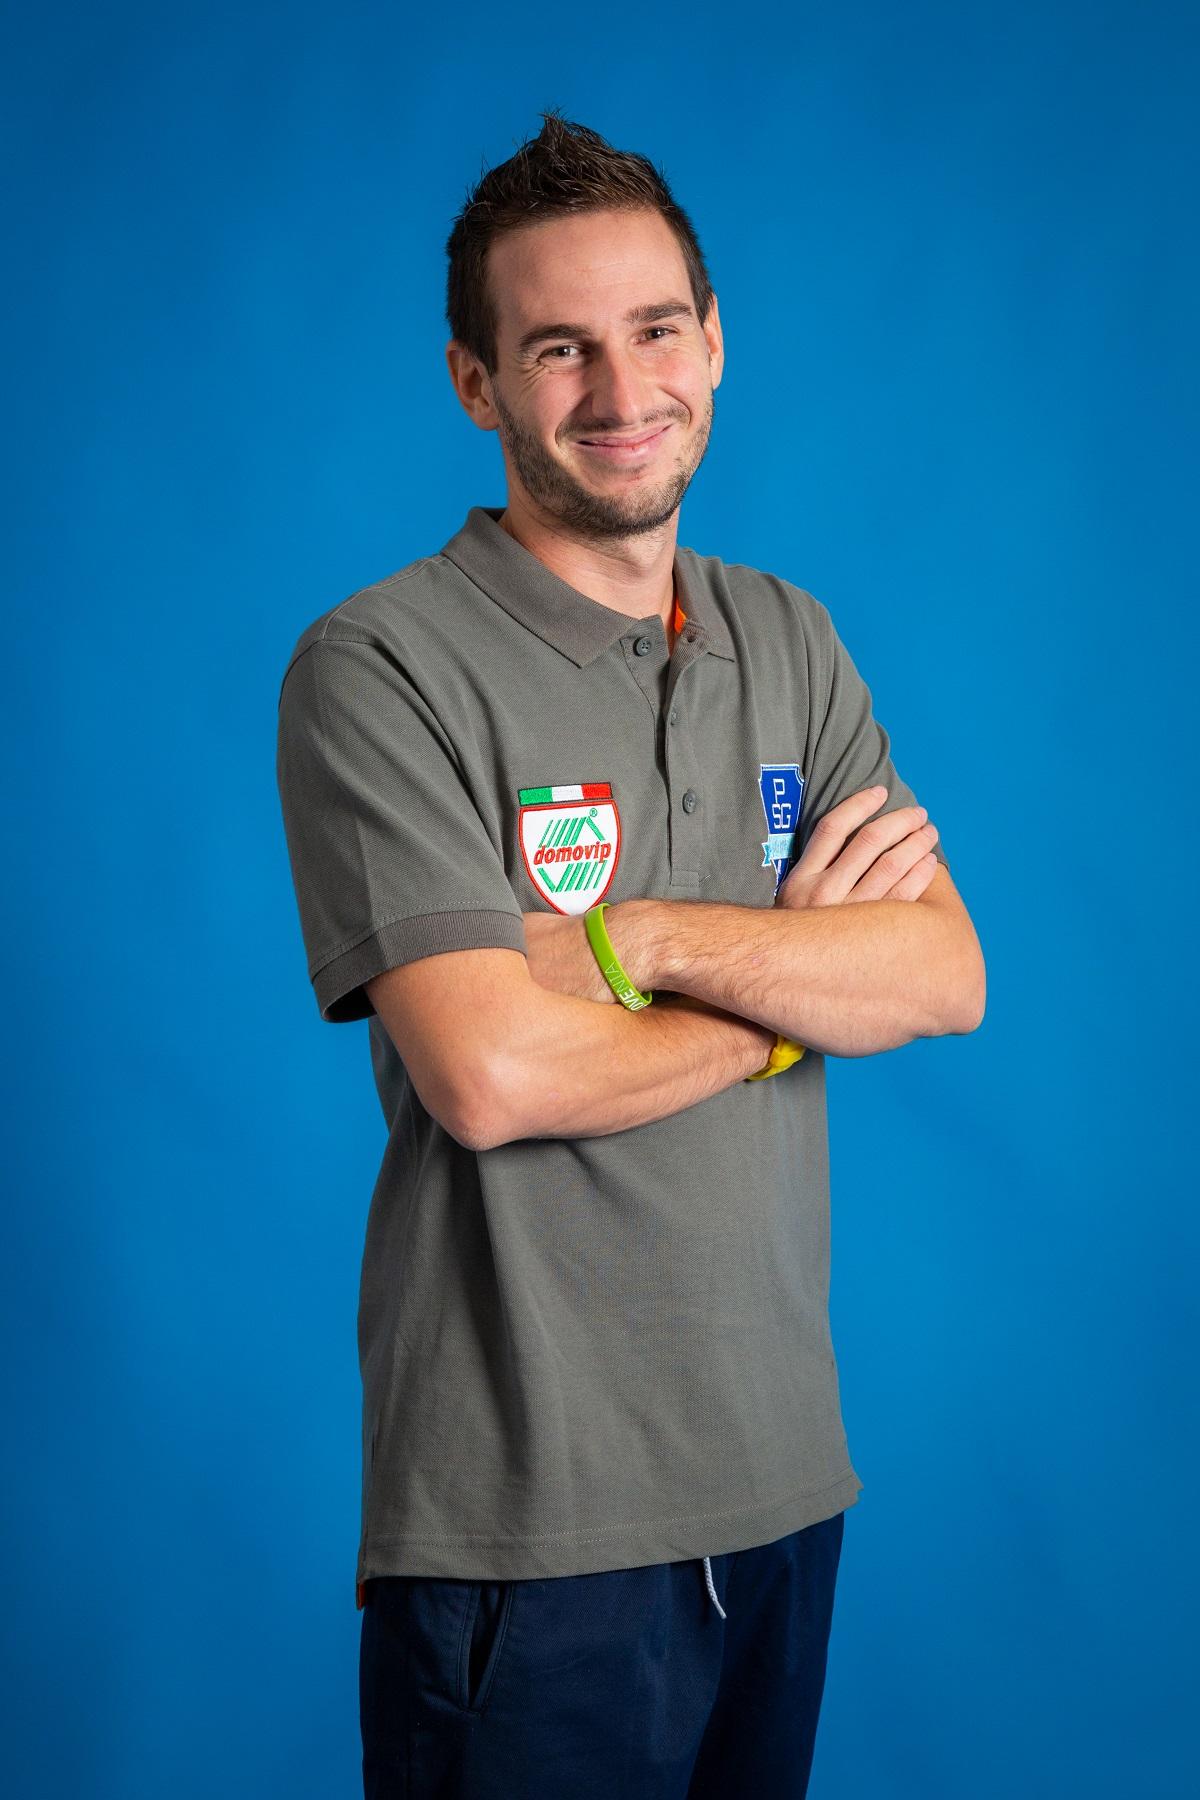 Francesco Zava